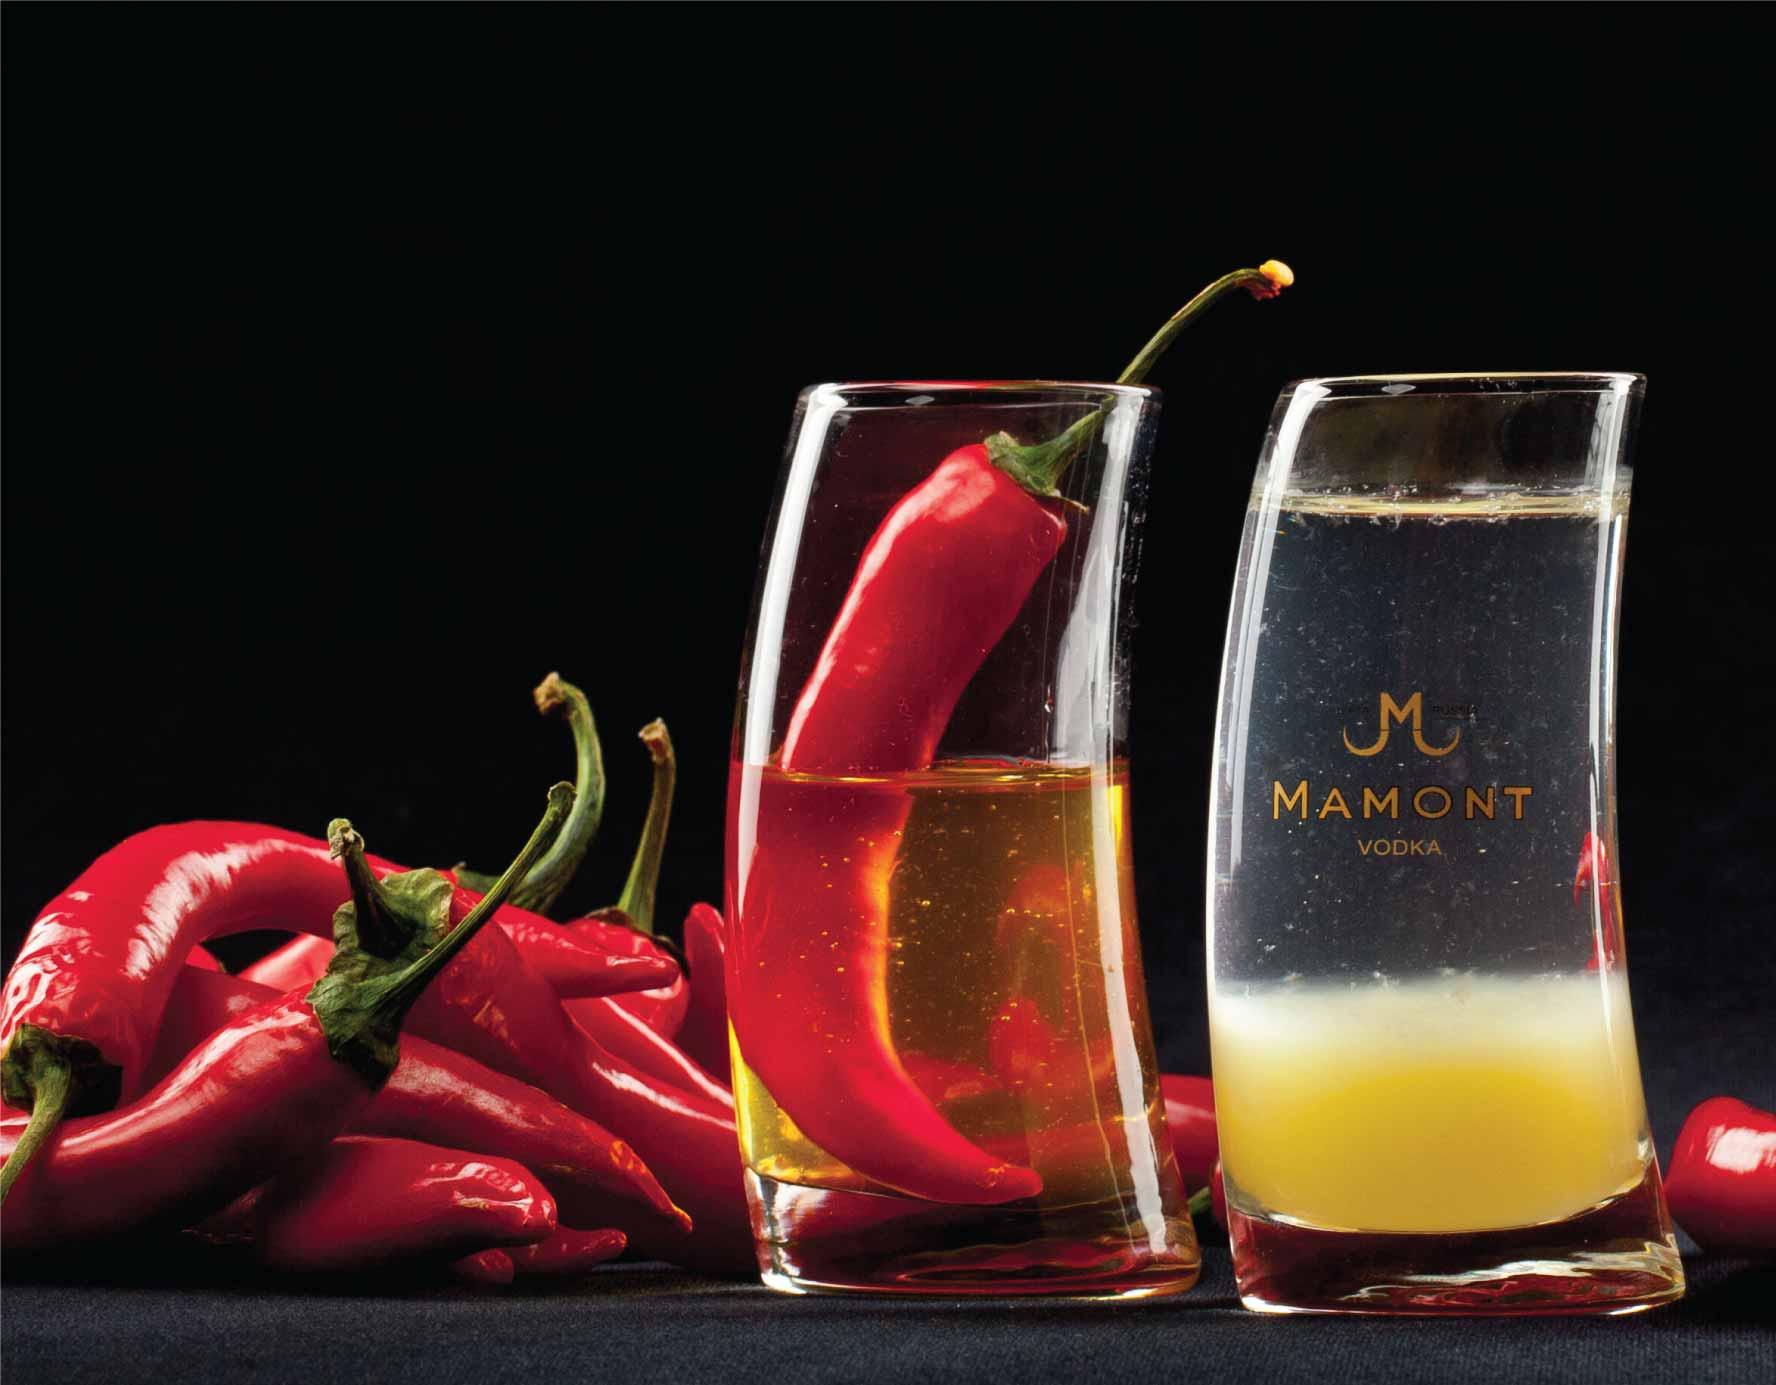 Choose adventure with Mamont Vodka shots #ChooseAdventure